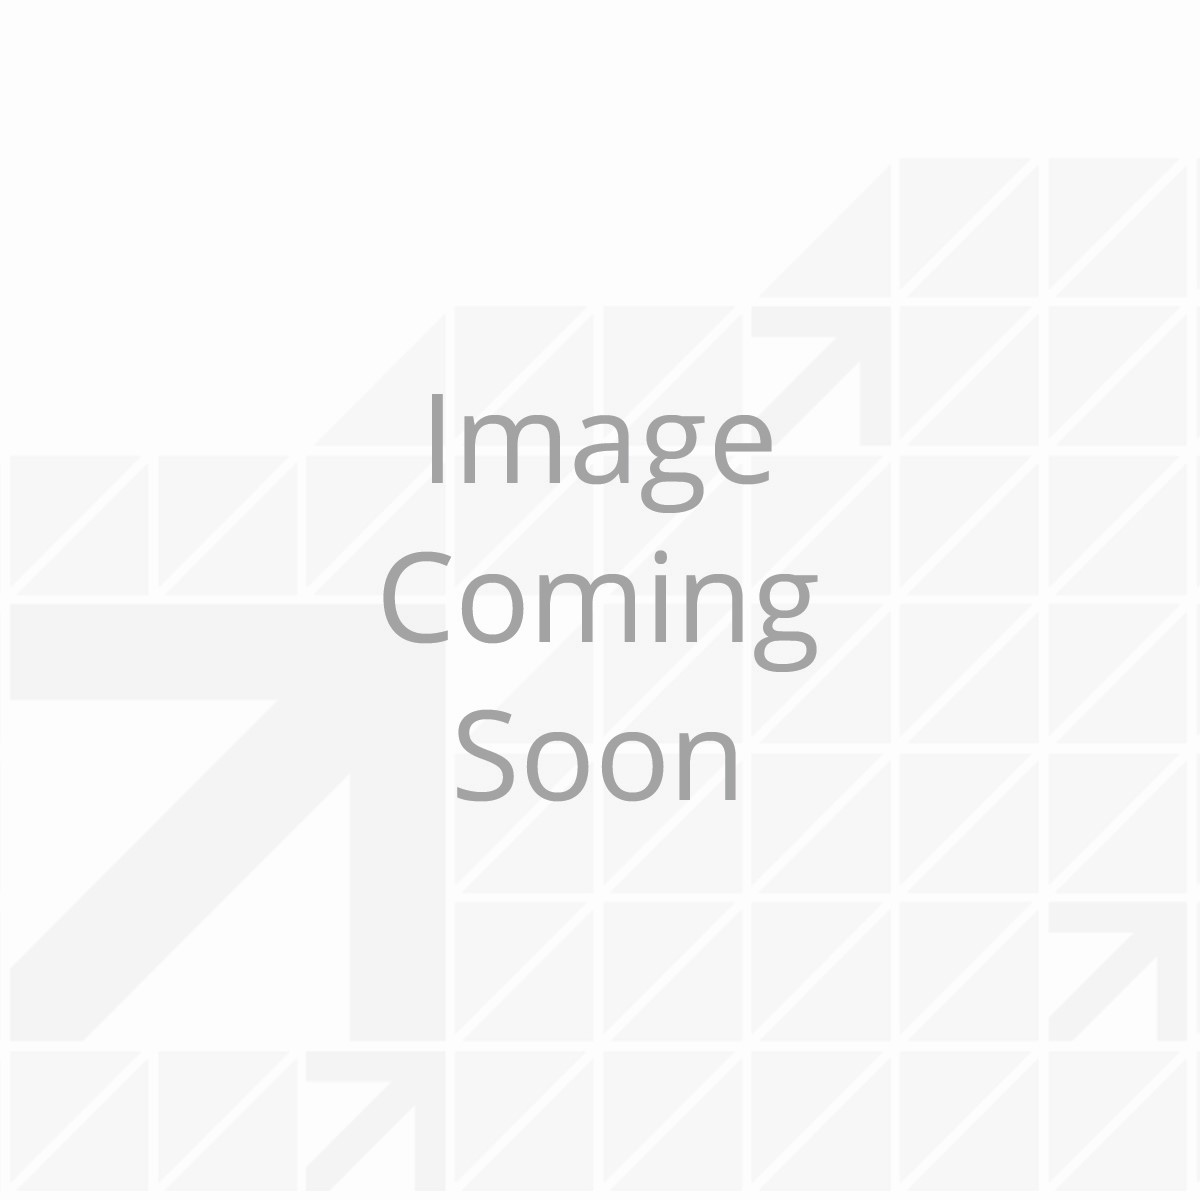 teddy_bear_bunk_cover_packaging_-_tan_-_01_3